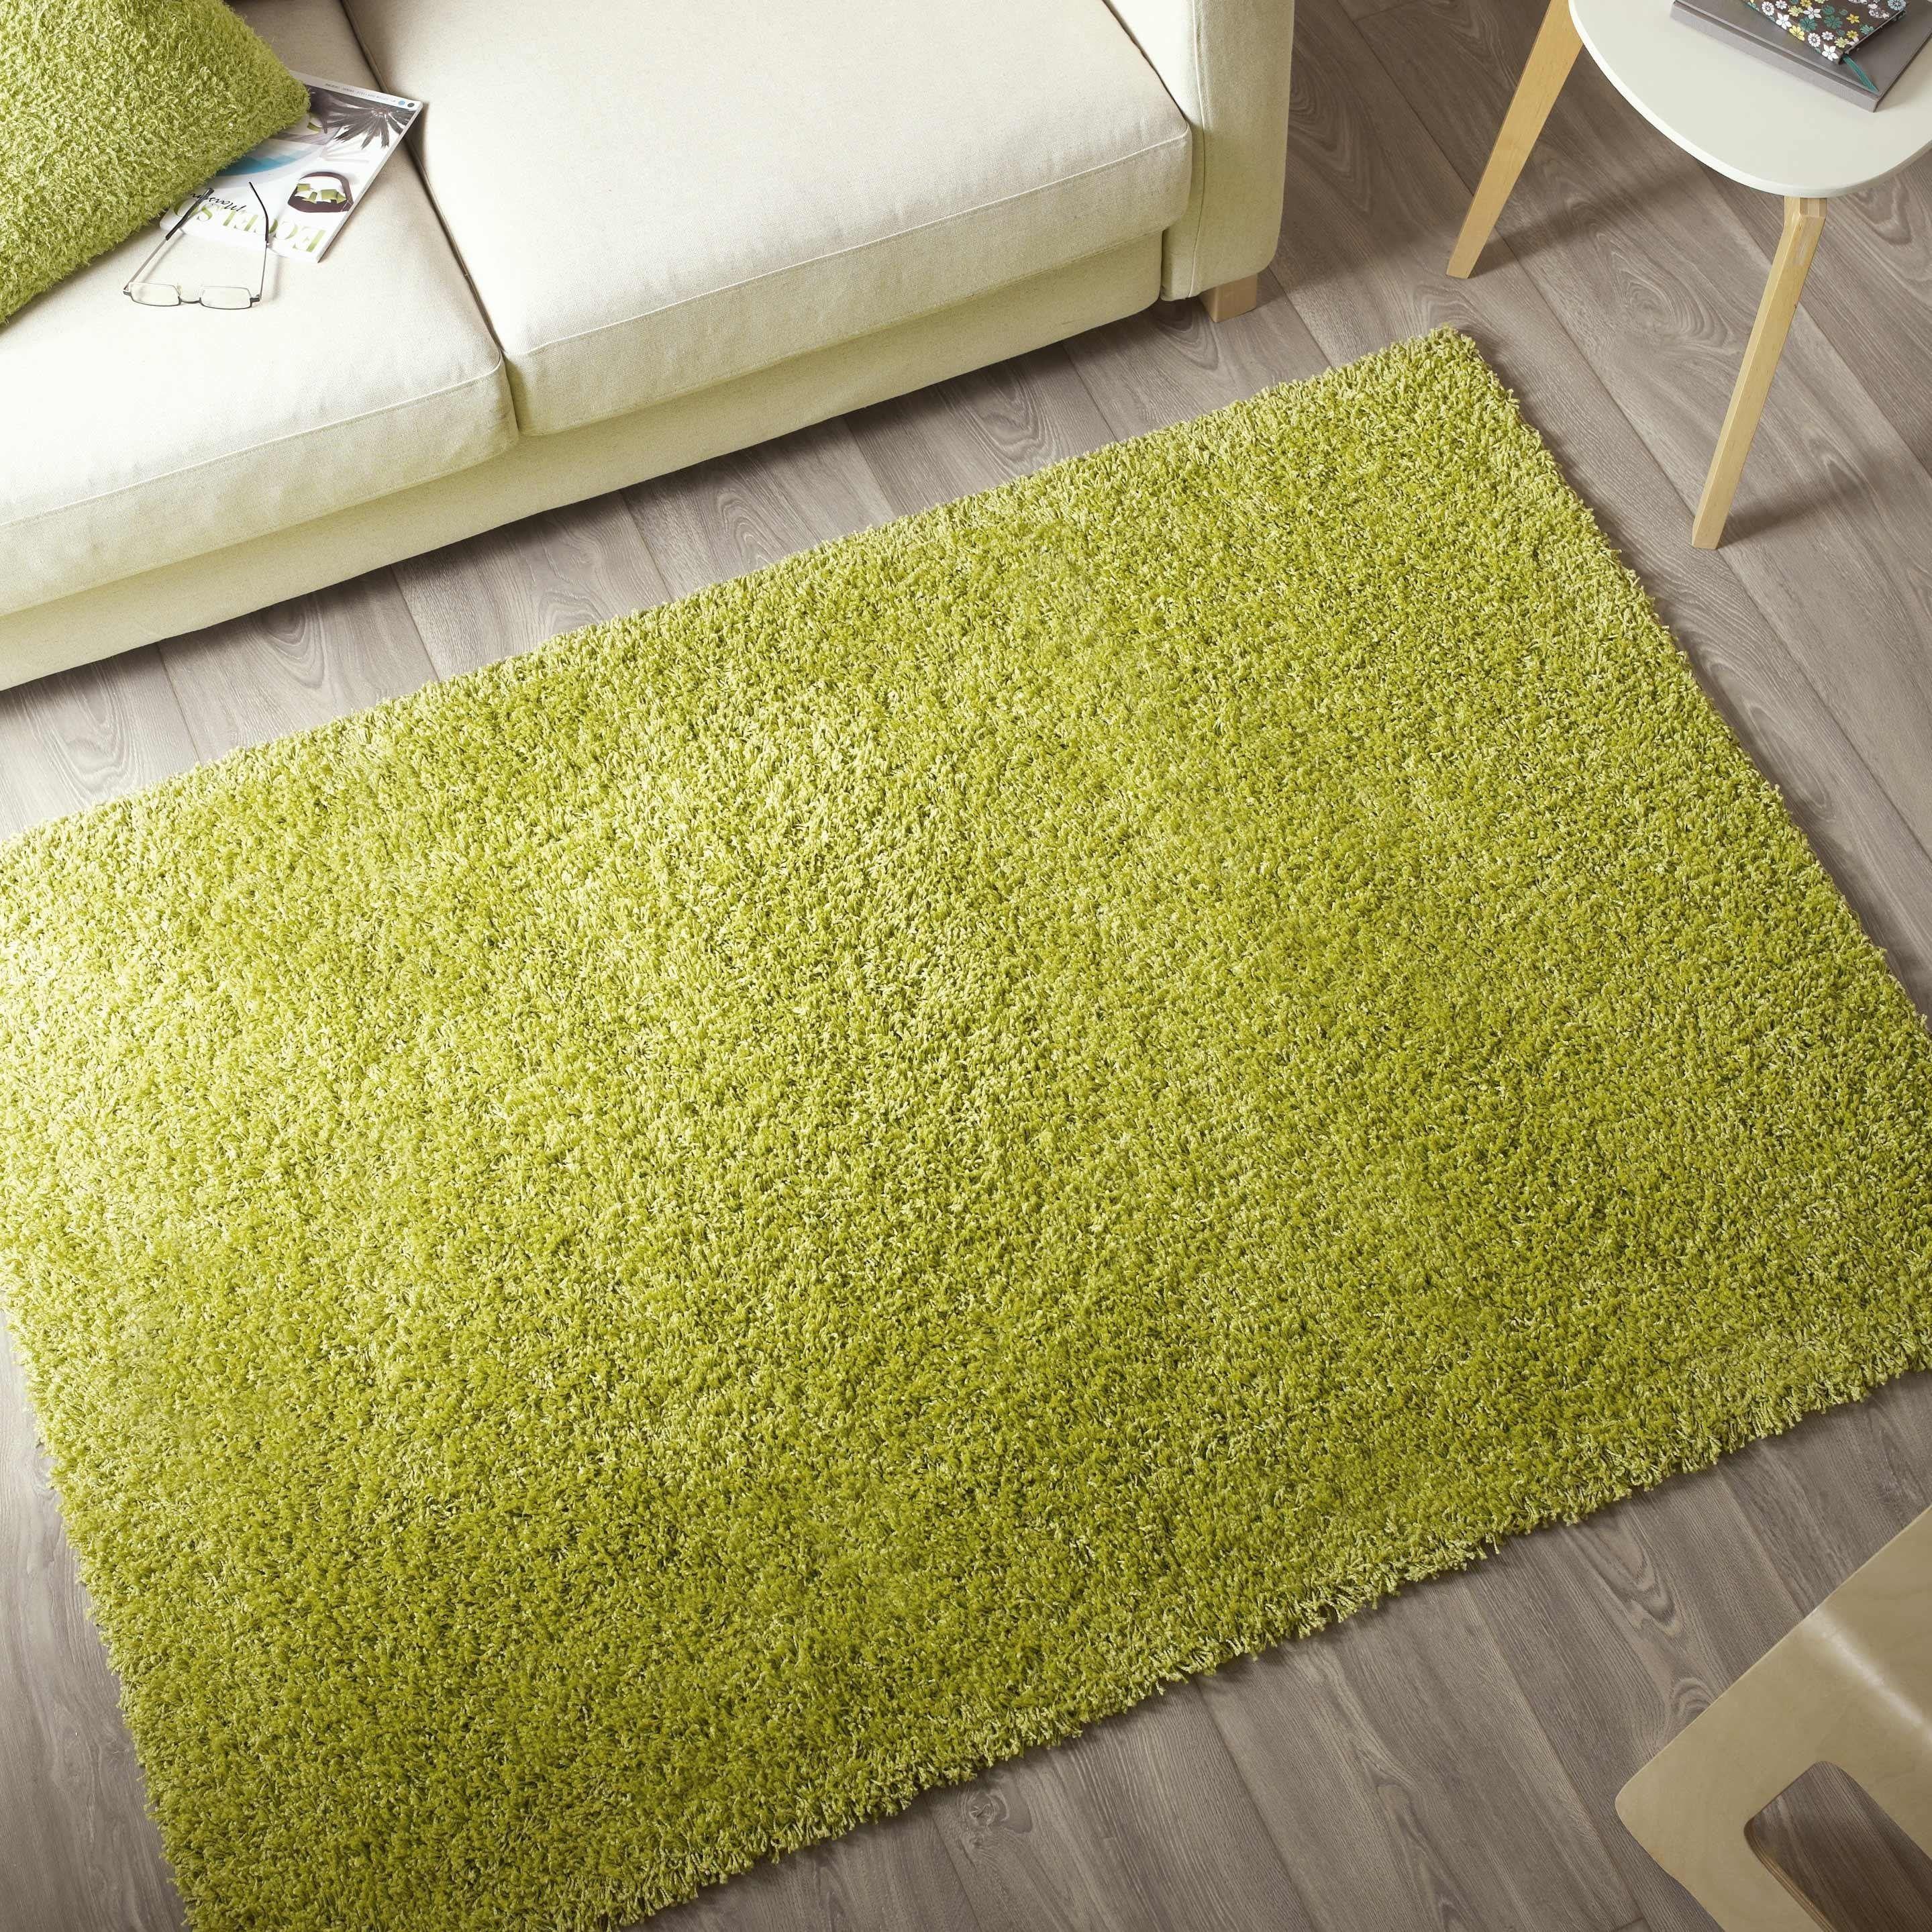 Meuble De Cuisine Vert Anis tapis vert anis shaggy pop, l.120 x l.170 cm en 2020   tapis